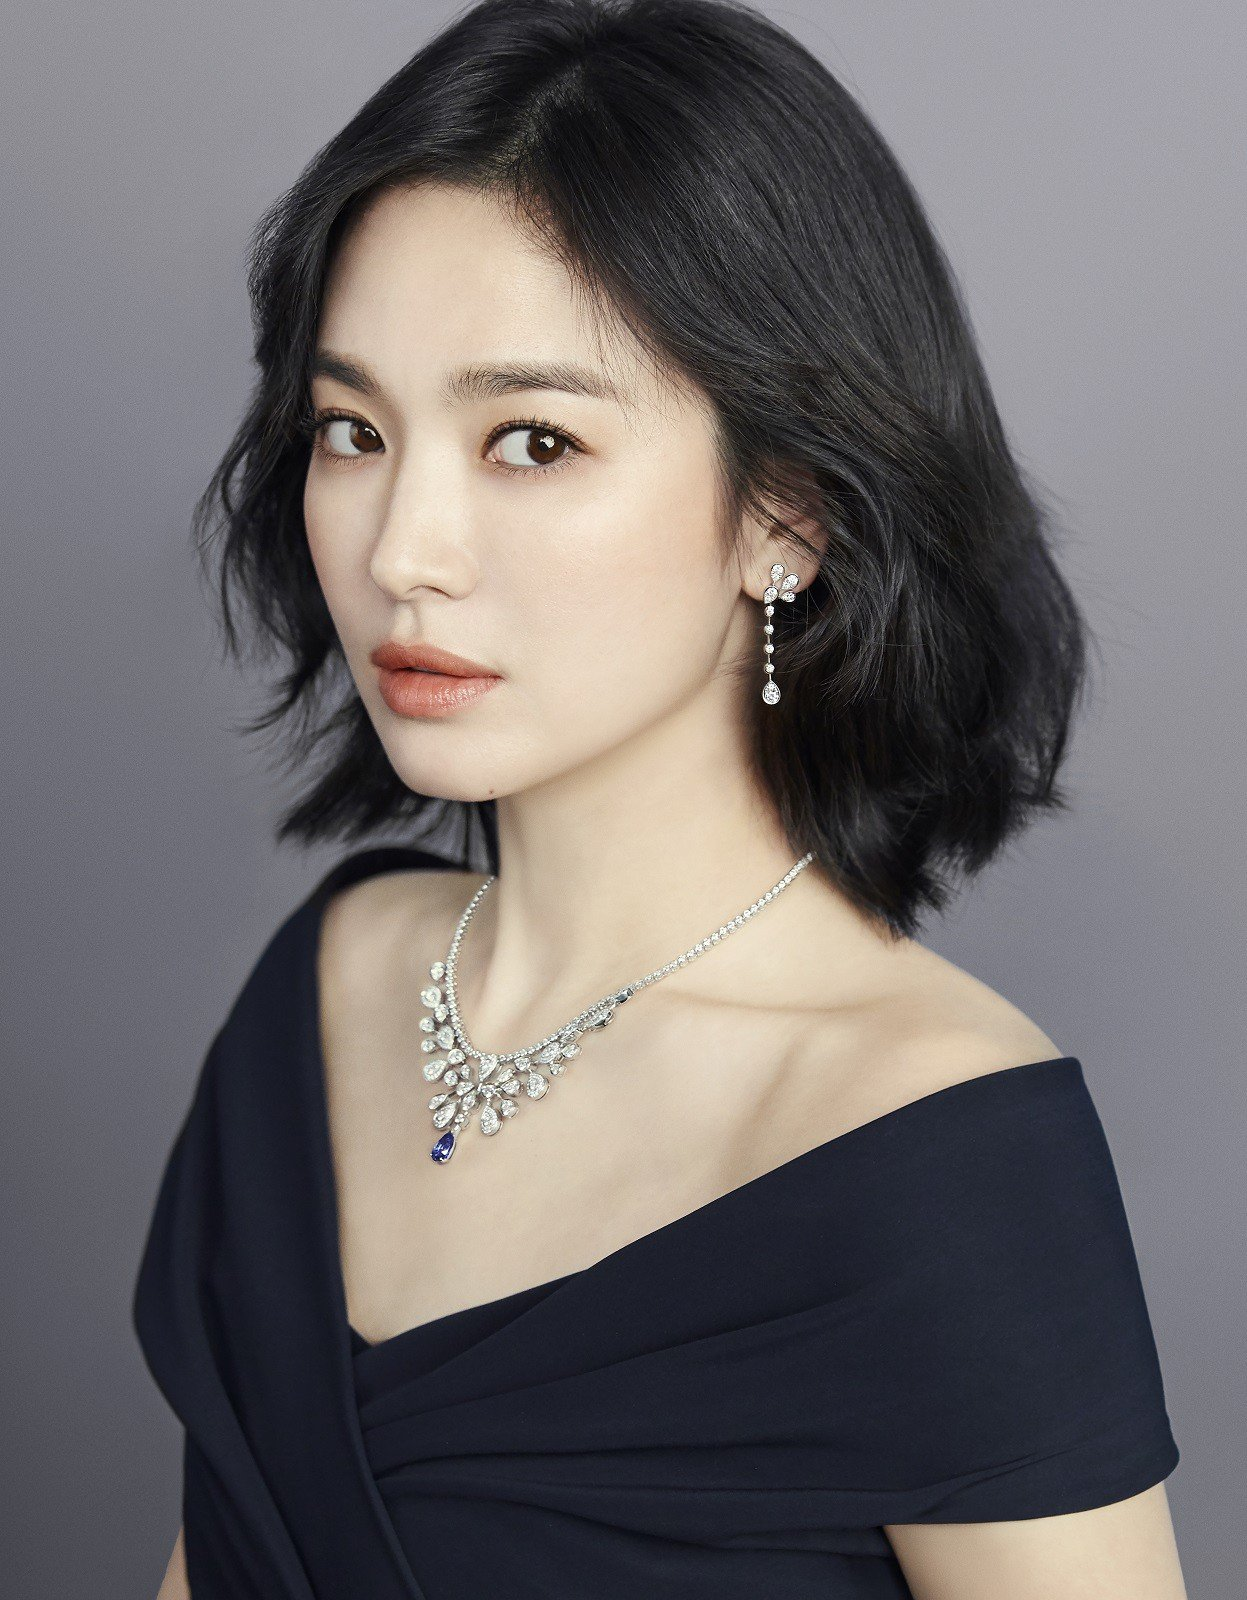 SongHyeKo